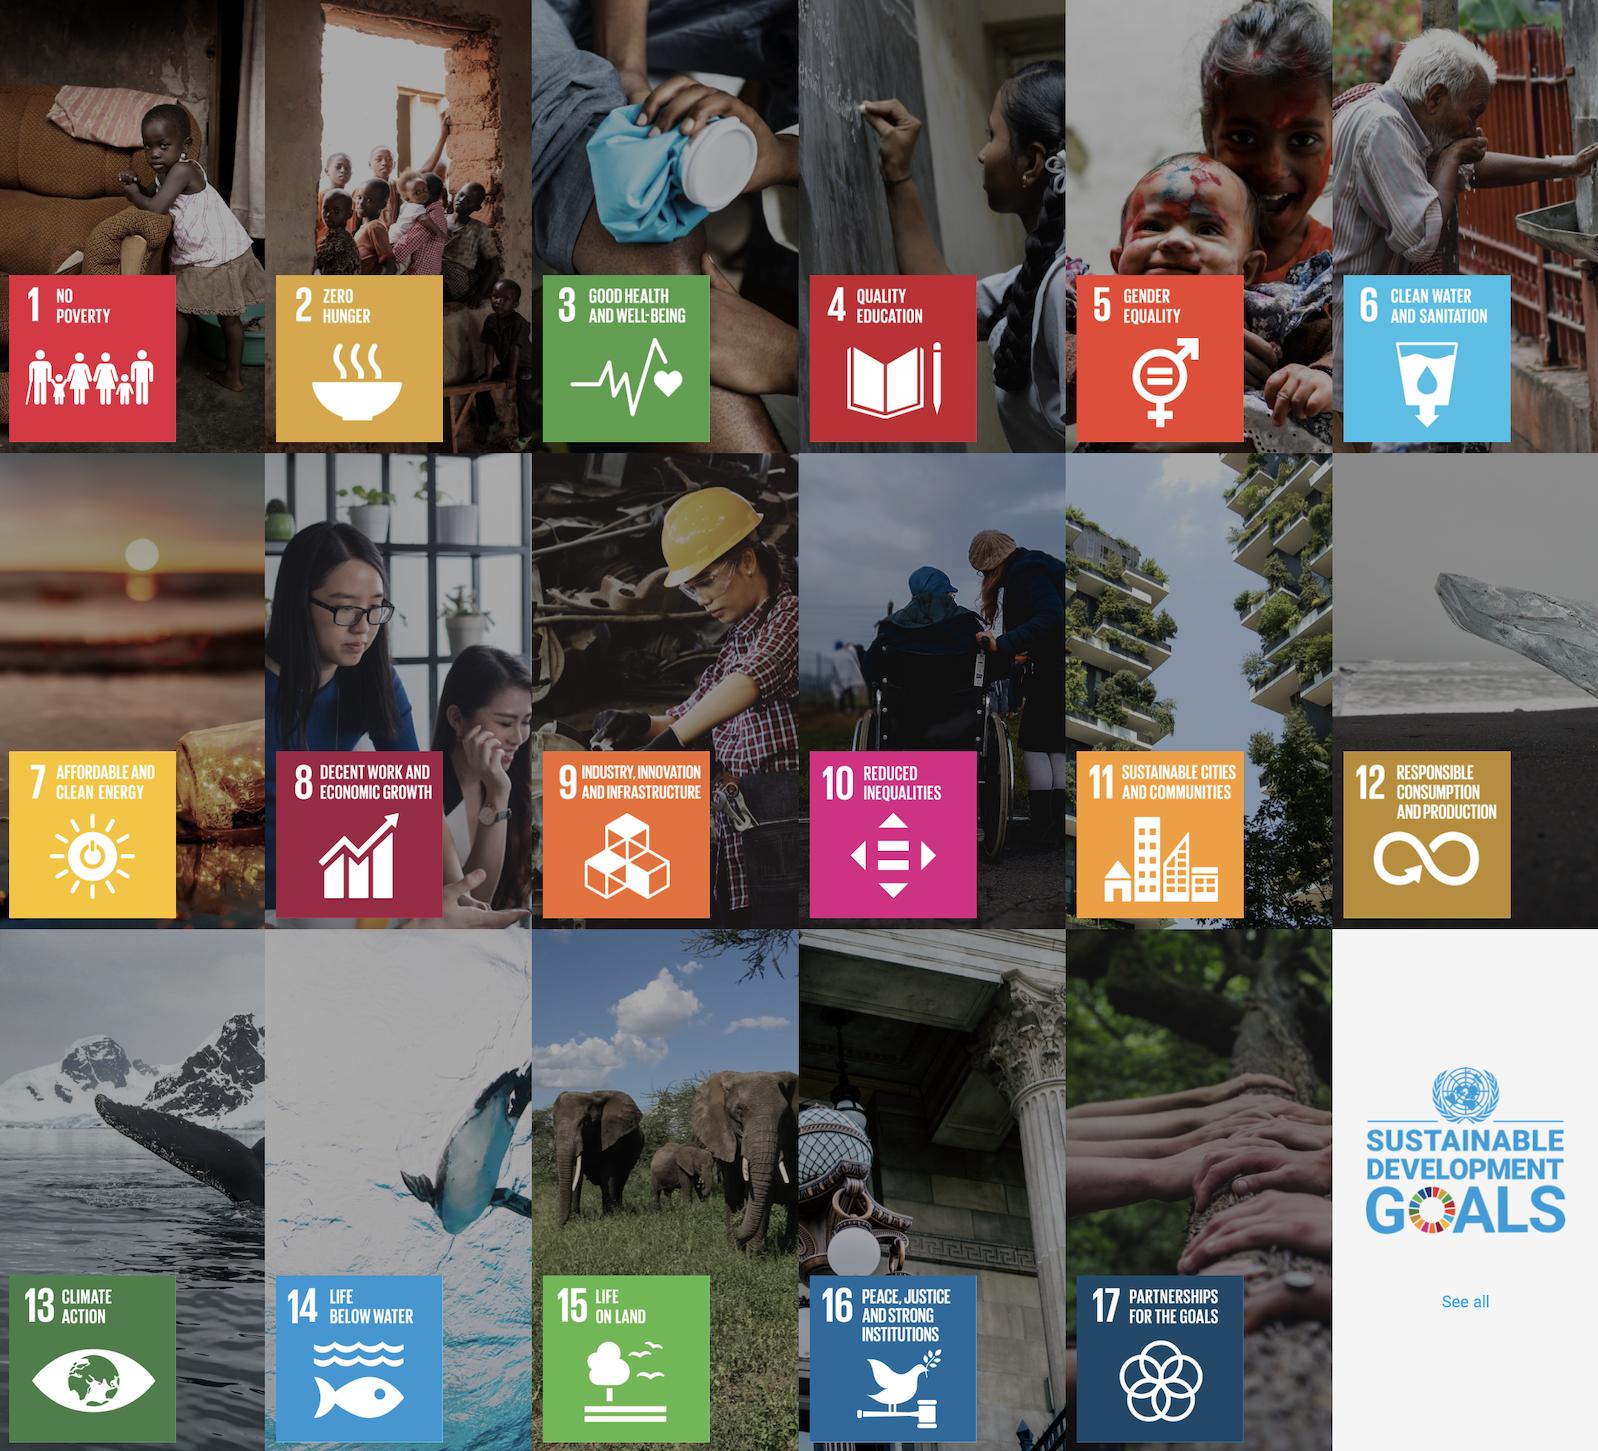 The UN's sustainable development goals.